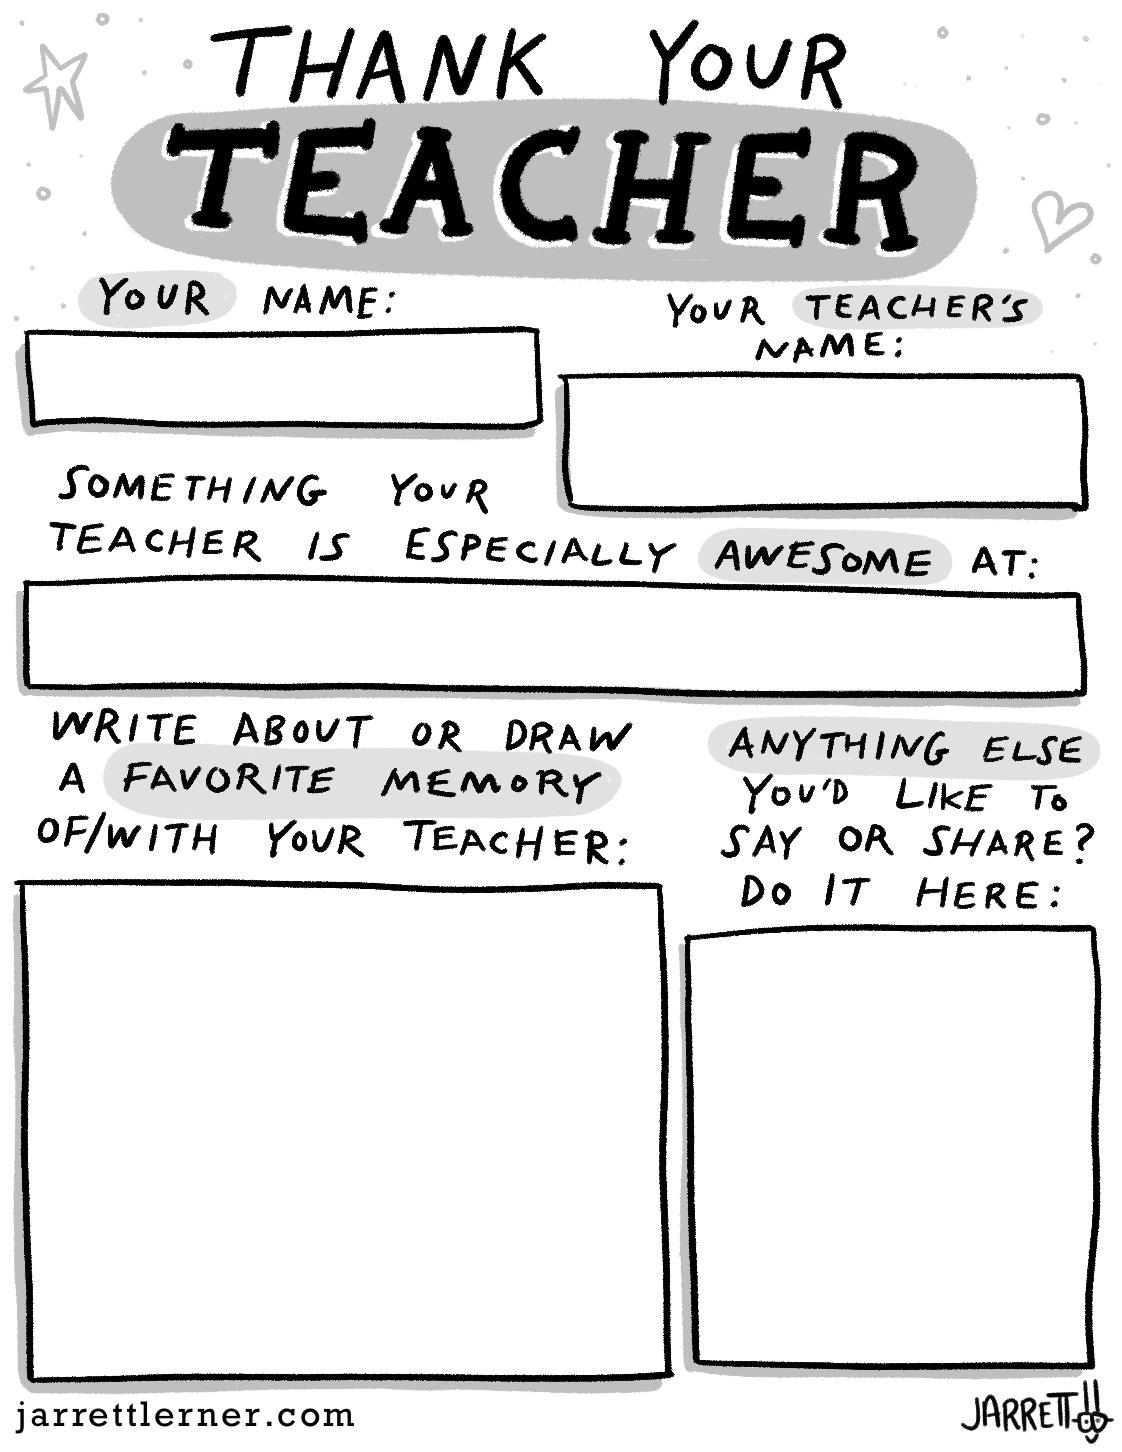 thank your teacher.jpg